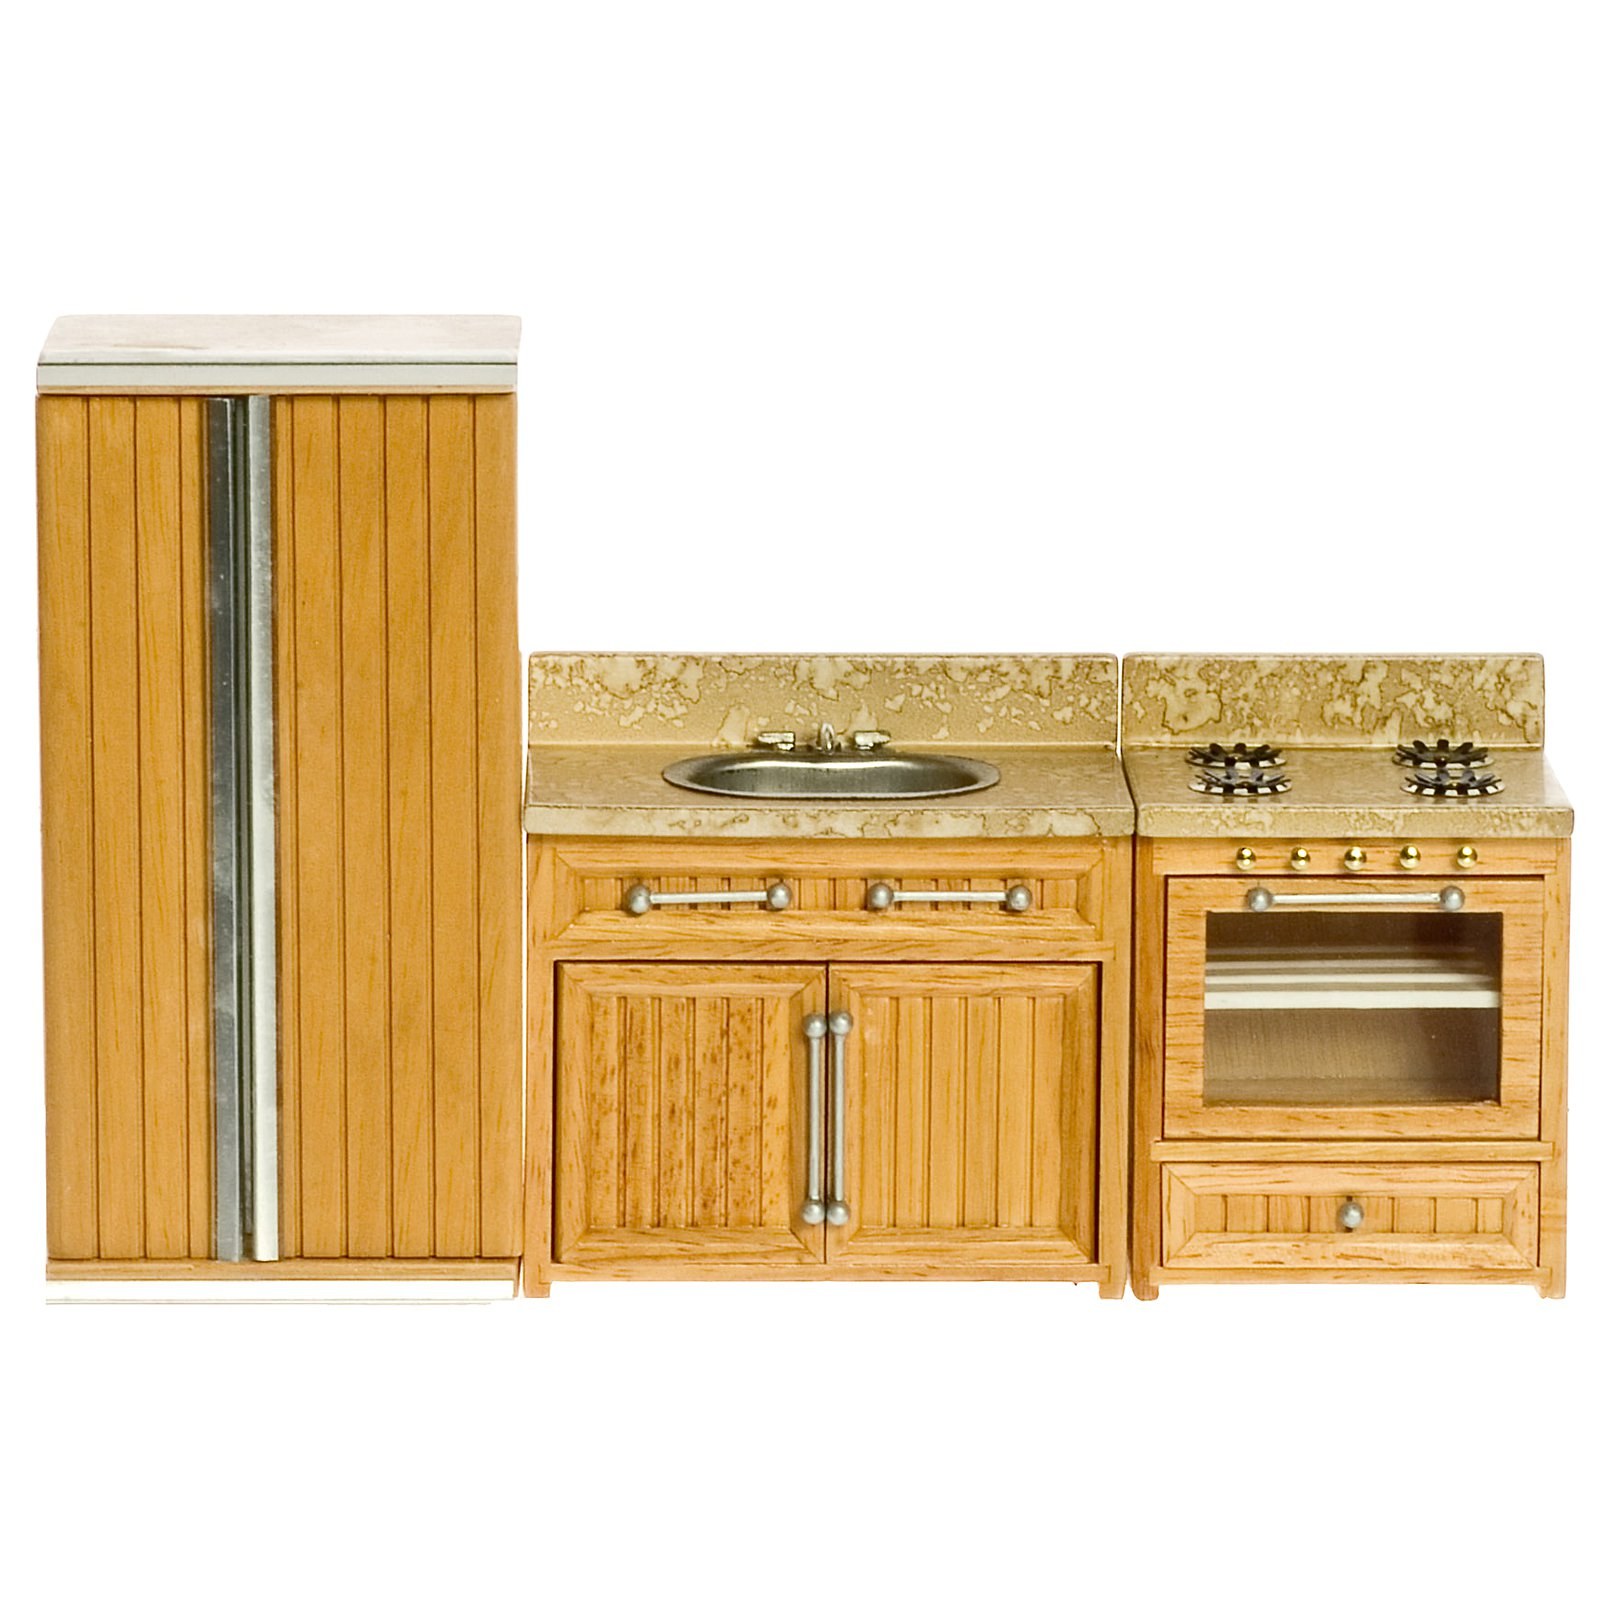 Oak Kitchen Appliance Dollhouse Miniature Set